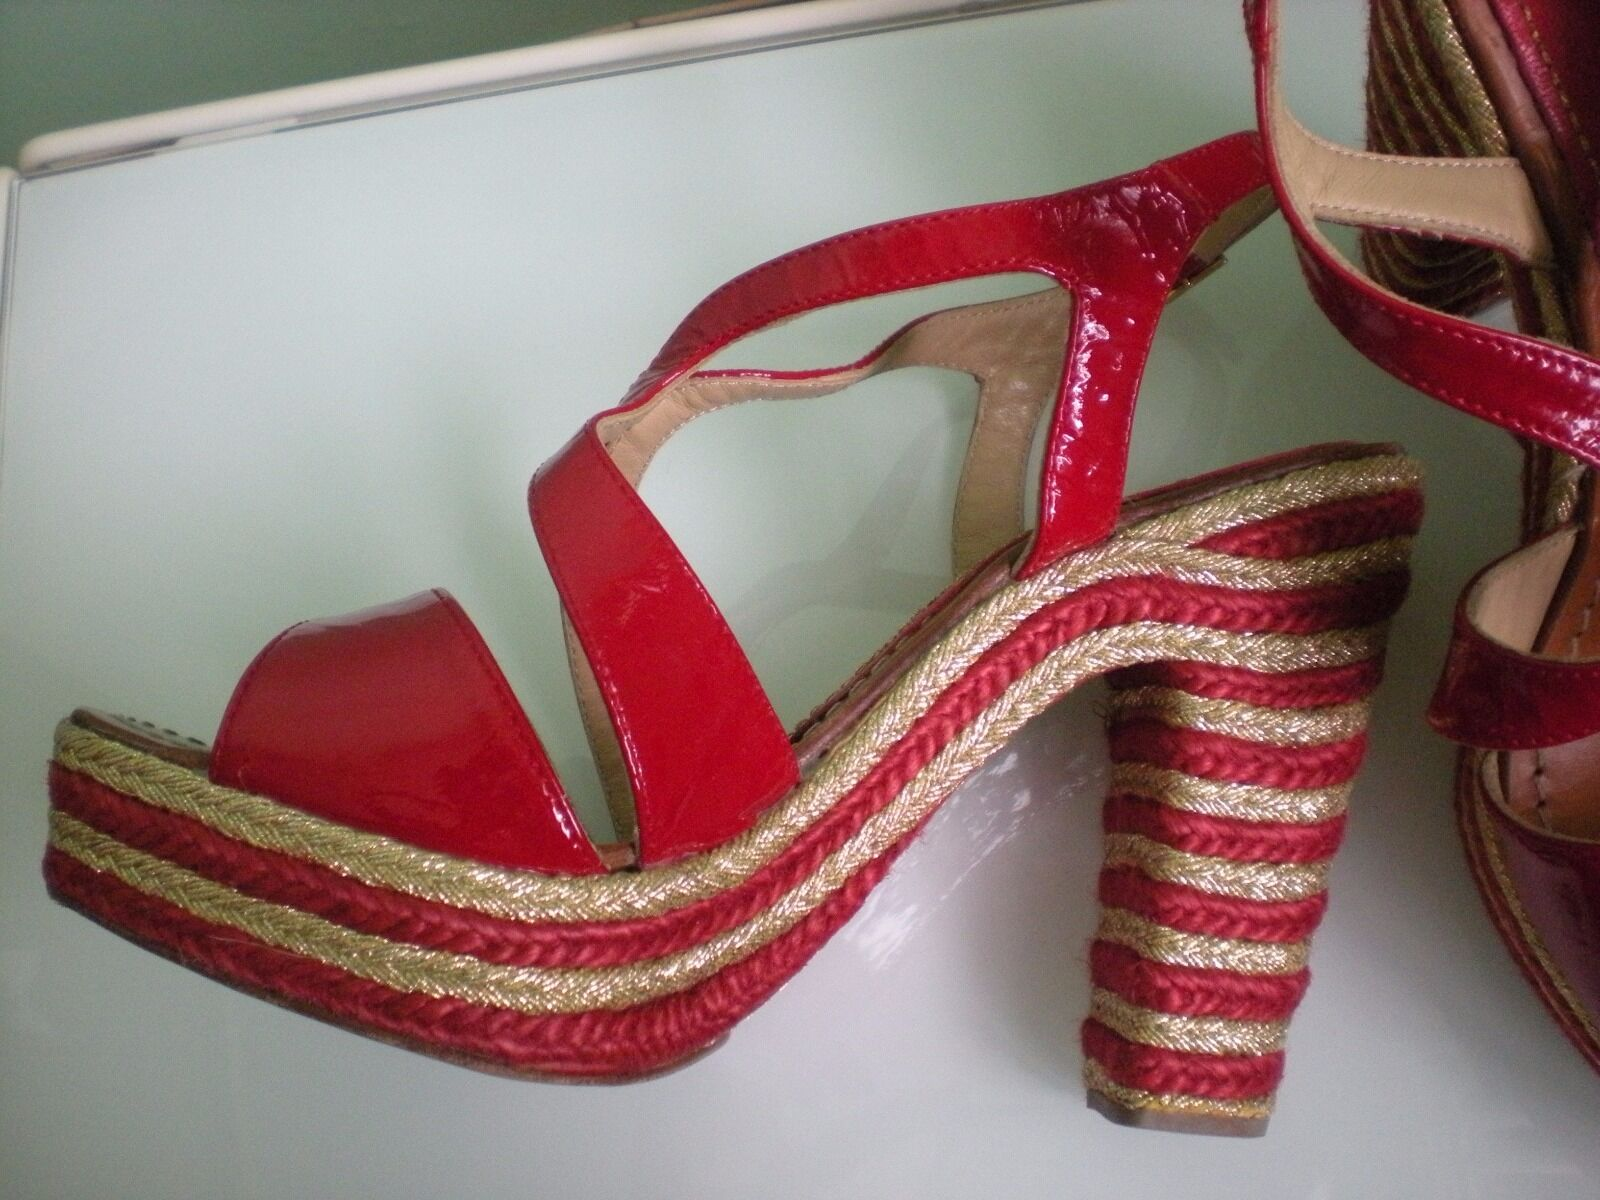 194 PALOMA BARCELO Anthropologie ROT Patent Leder Gold Heel Schuhes Spain SZ 7